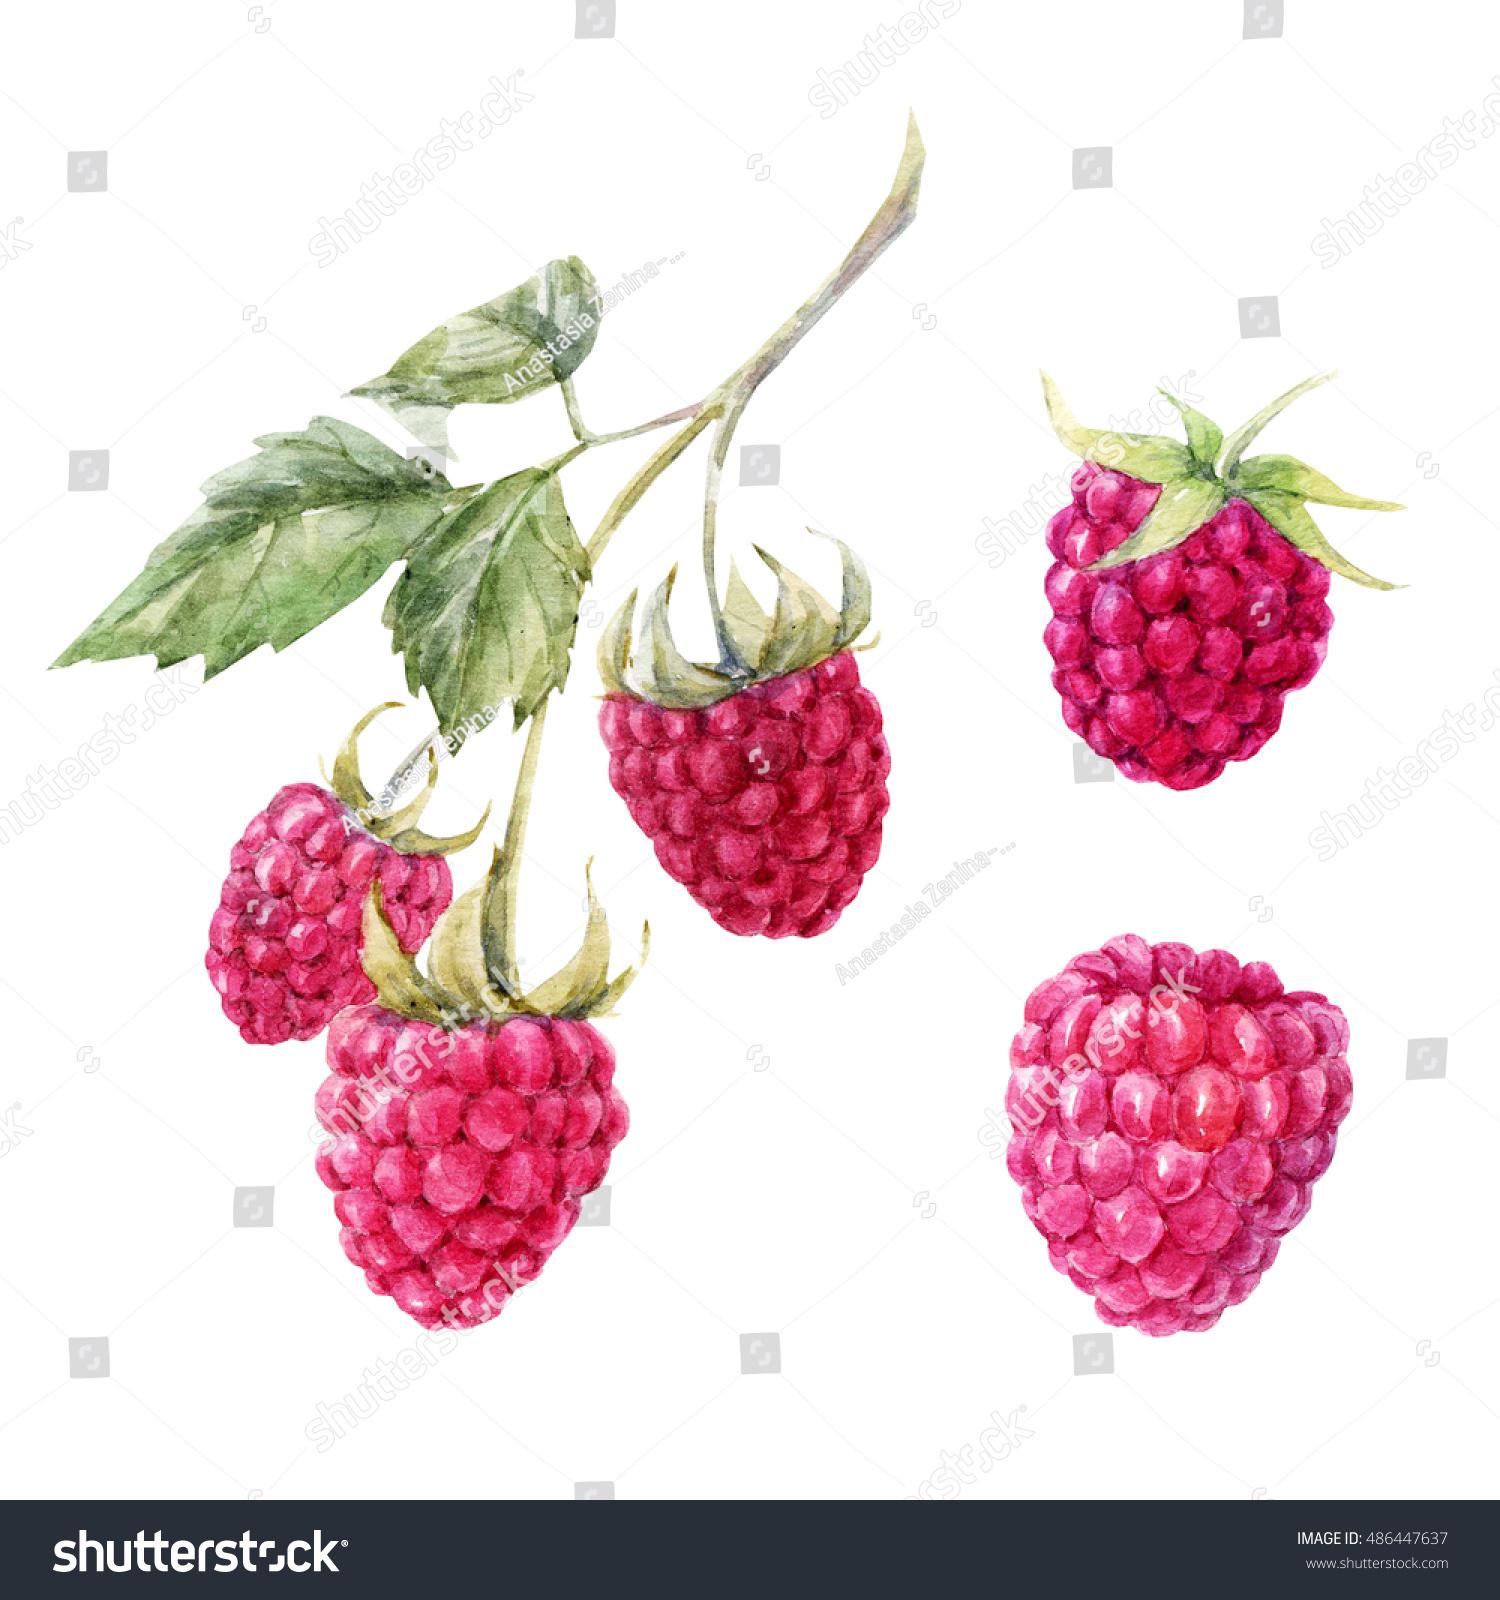 Raspberry: useful properties of berries and leaves 38